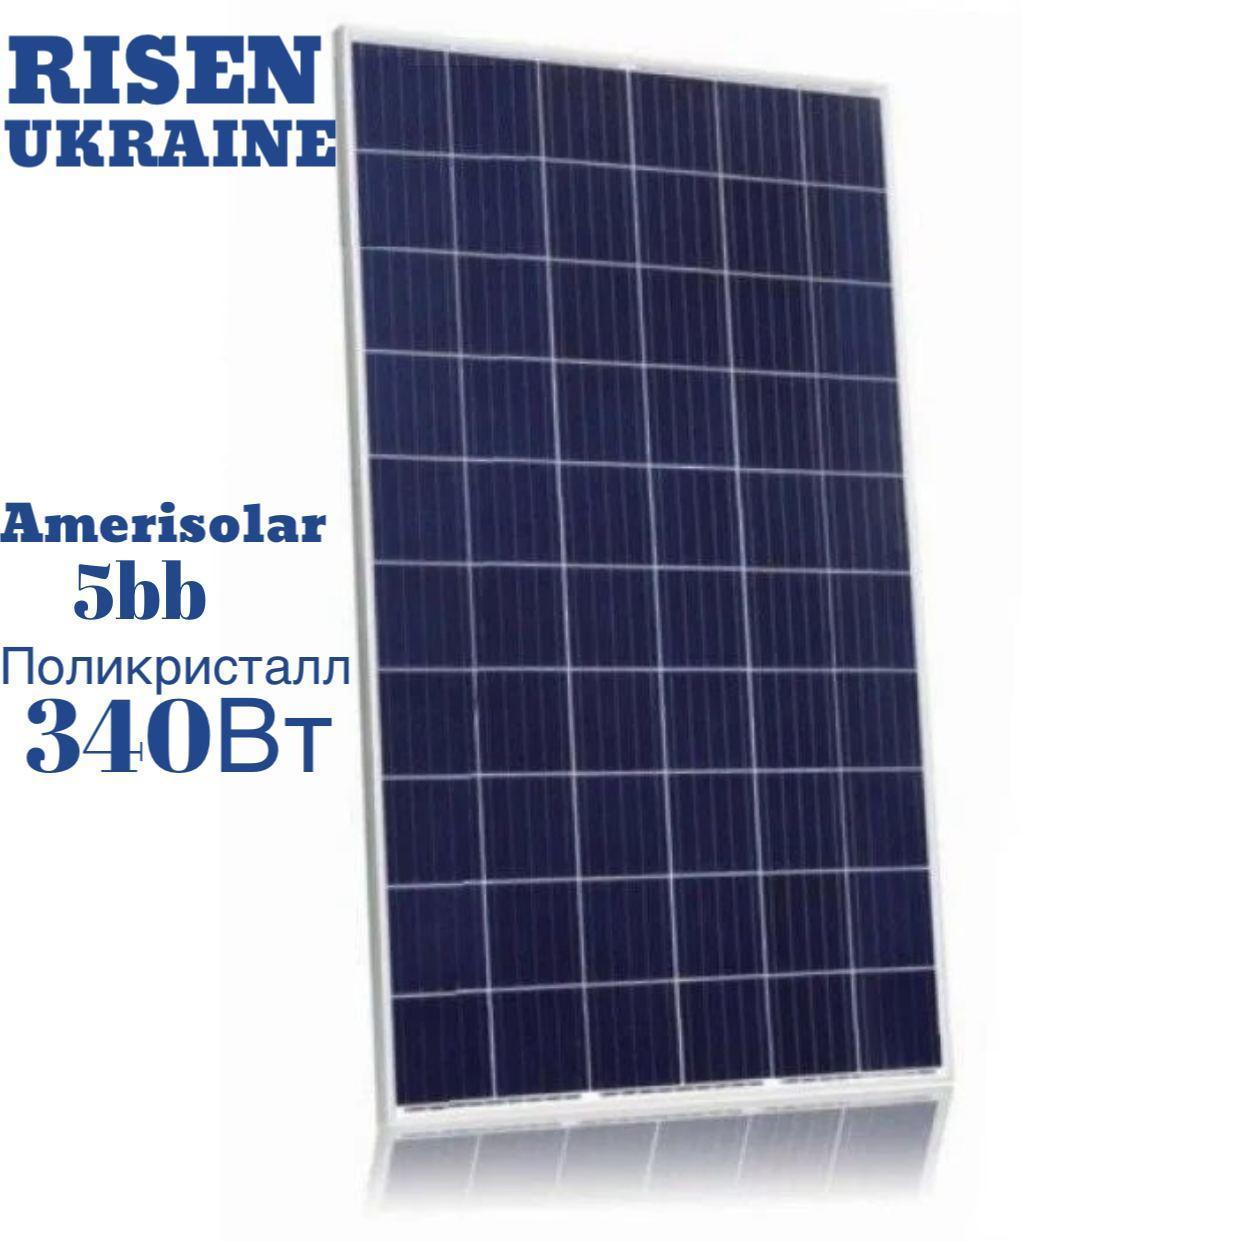 Солнечная батарея Amerisolar 340Вт поли, AS-6P-340 / 5BB